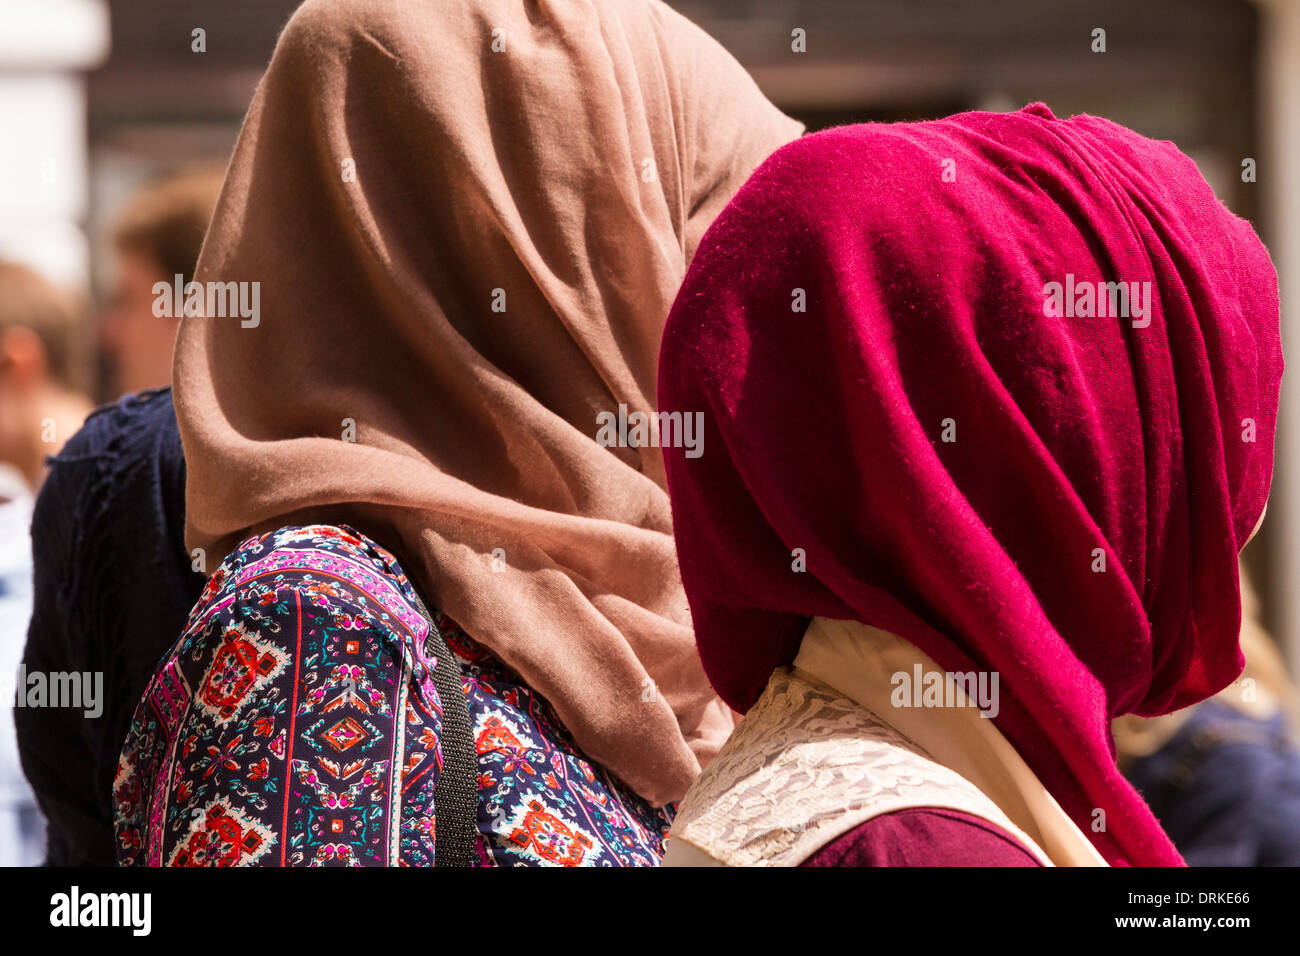 Muslim women head covering - Stock Image